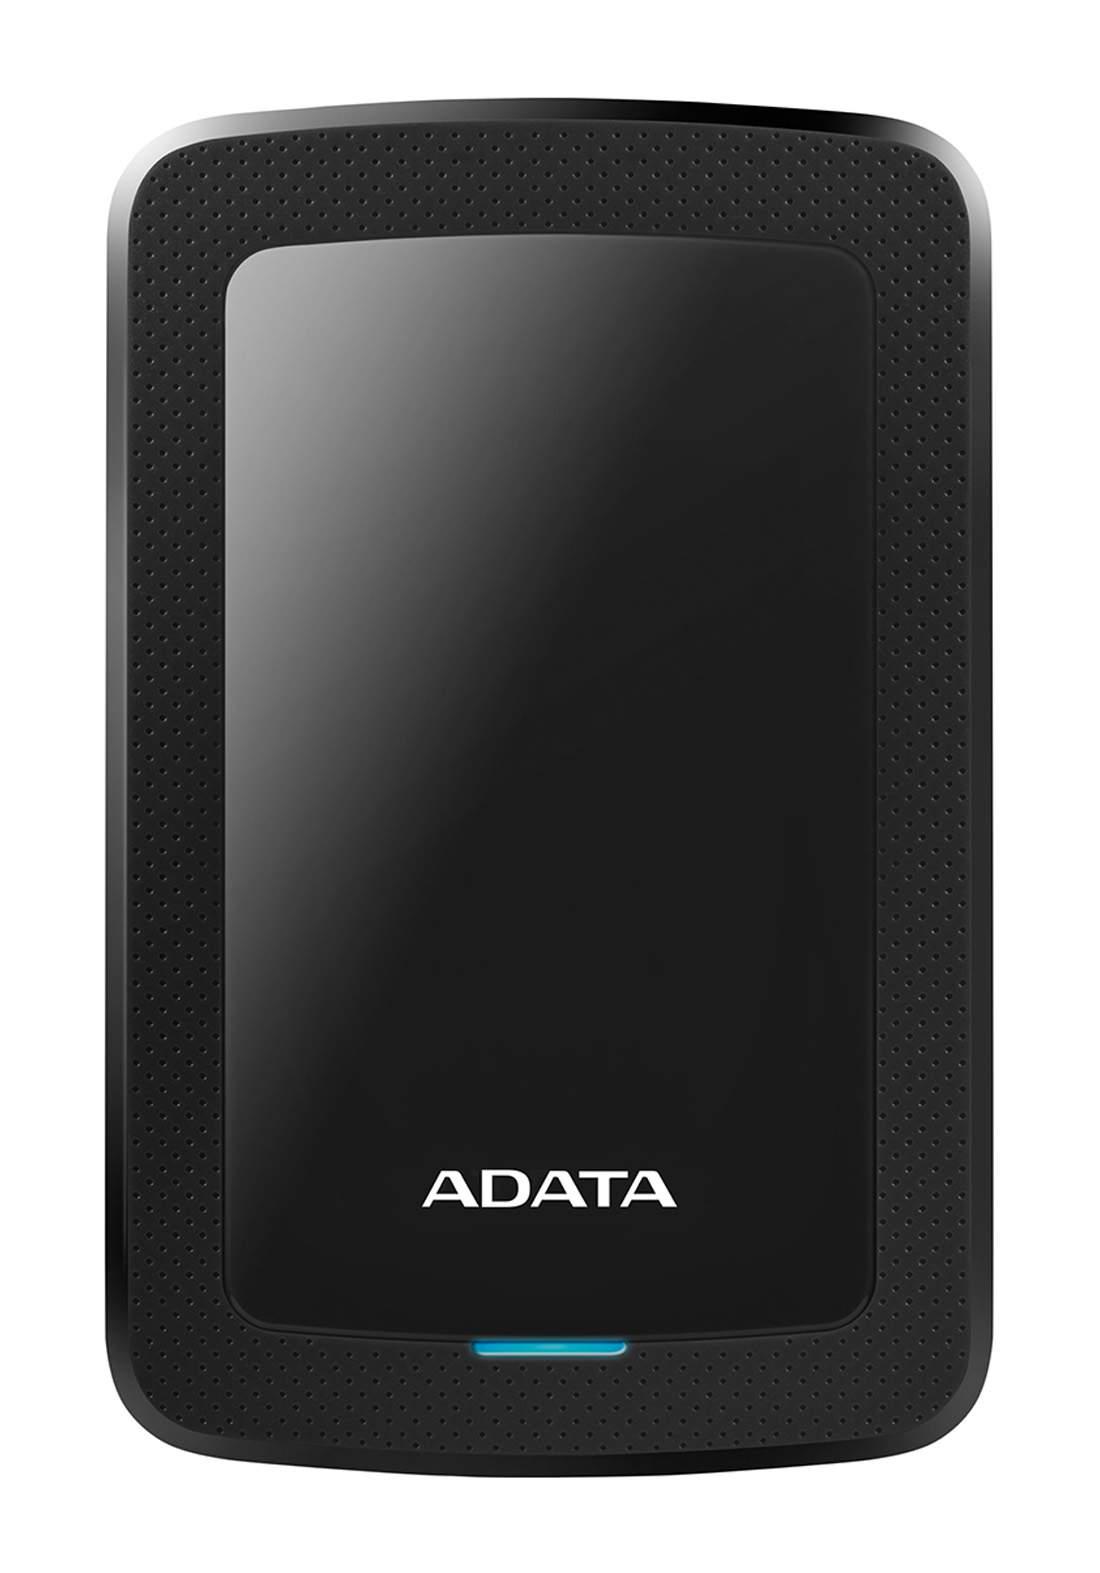 ADATA HV300 1TB Silm External Hard Drive - Black هارد خارجي